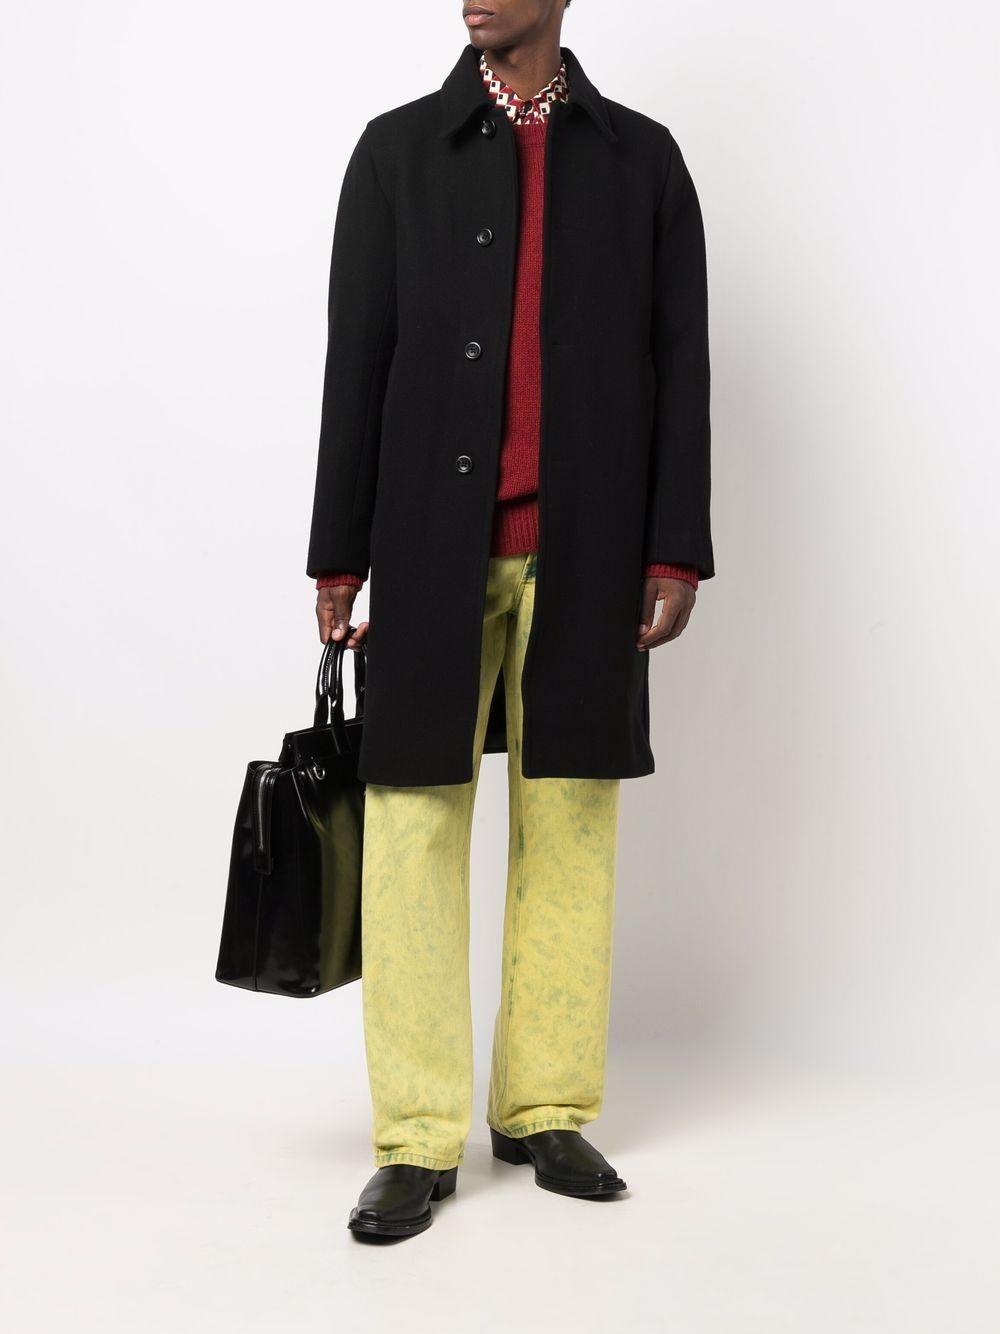 pantaloni pine uomo gialli in cotone DRIES VAN NOTEN   Pantaloni   PINE 3382201